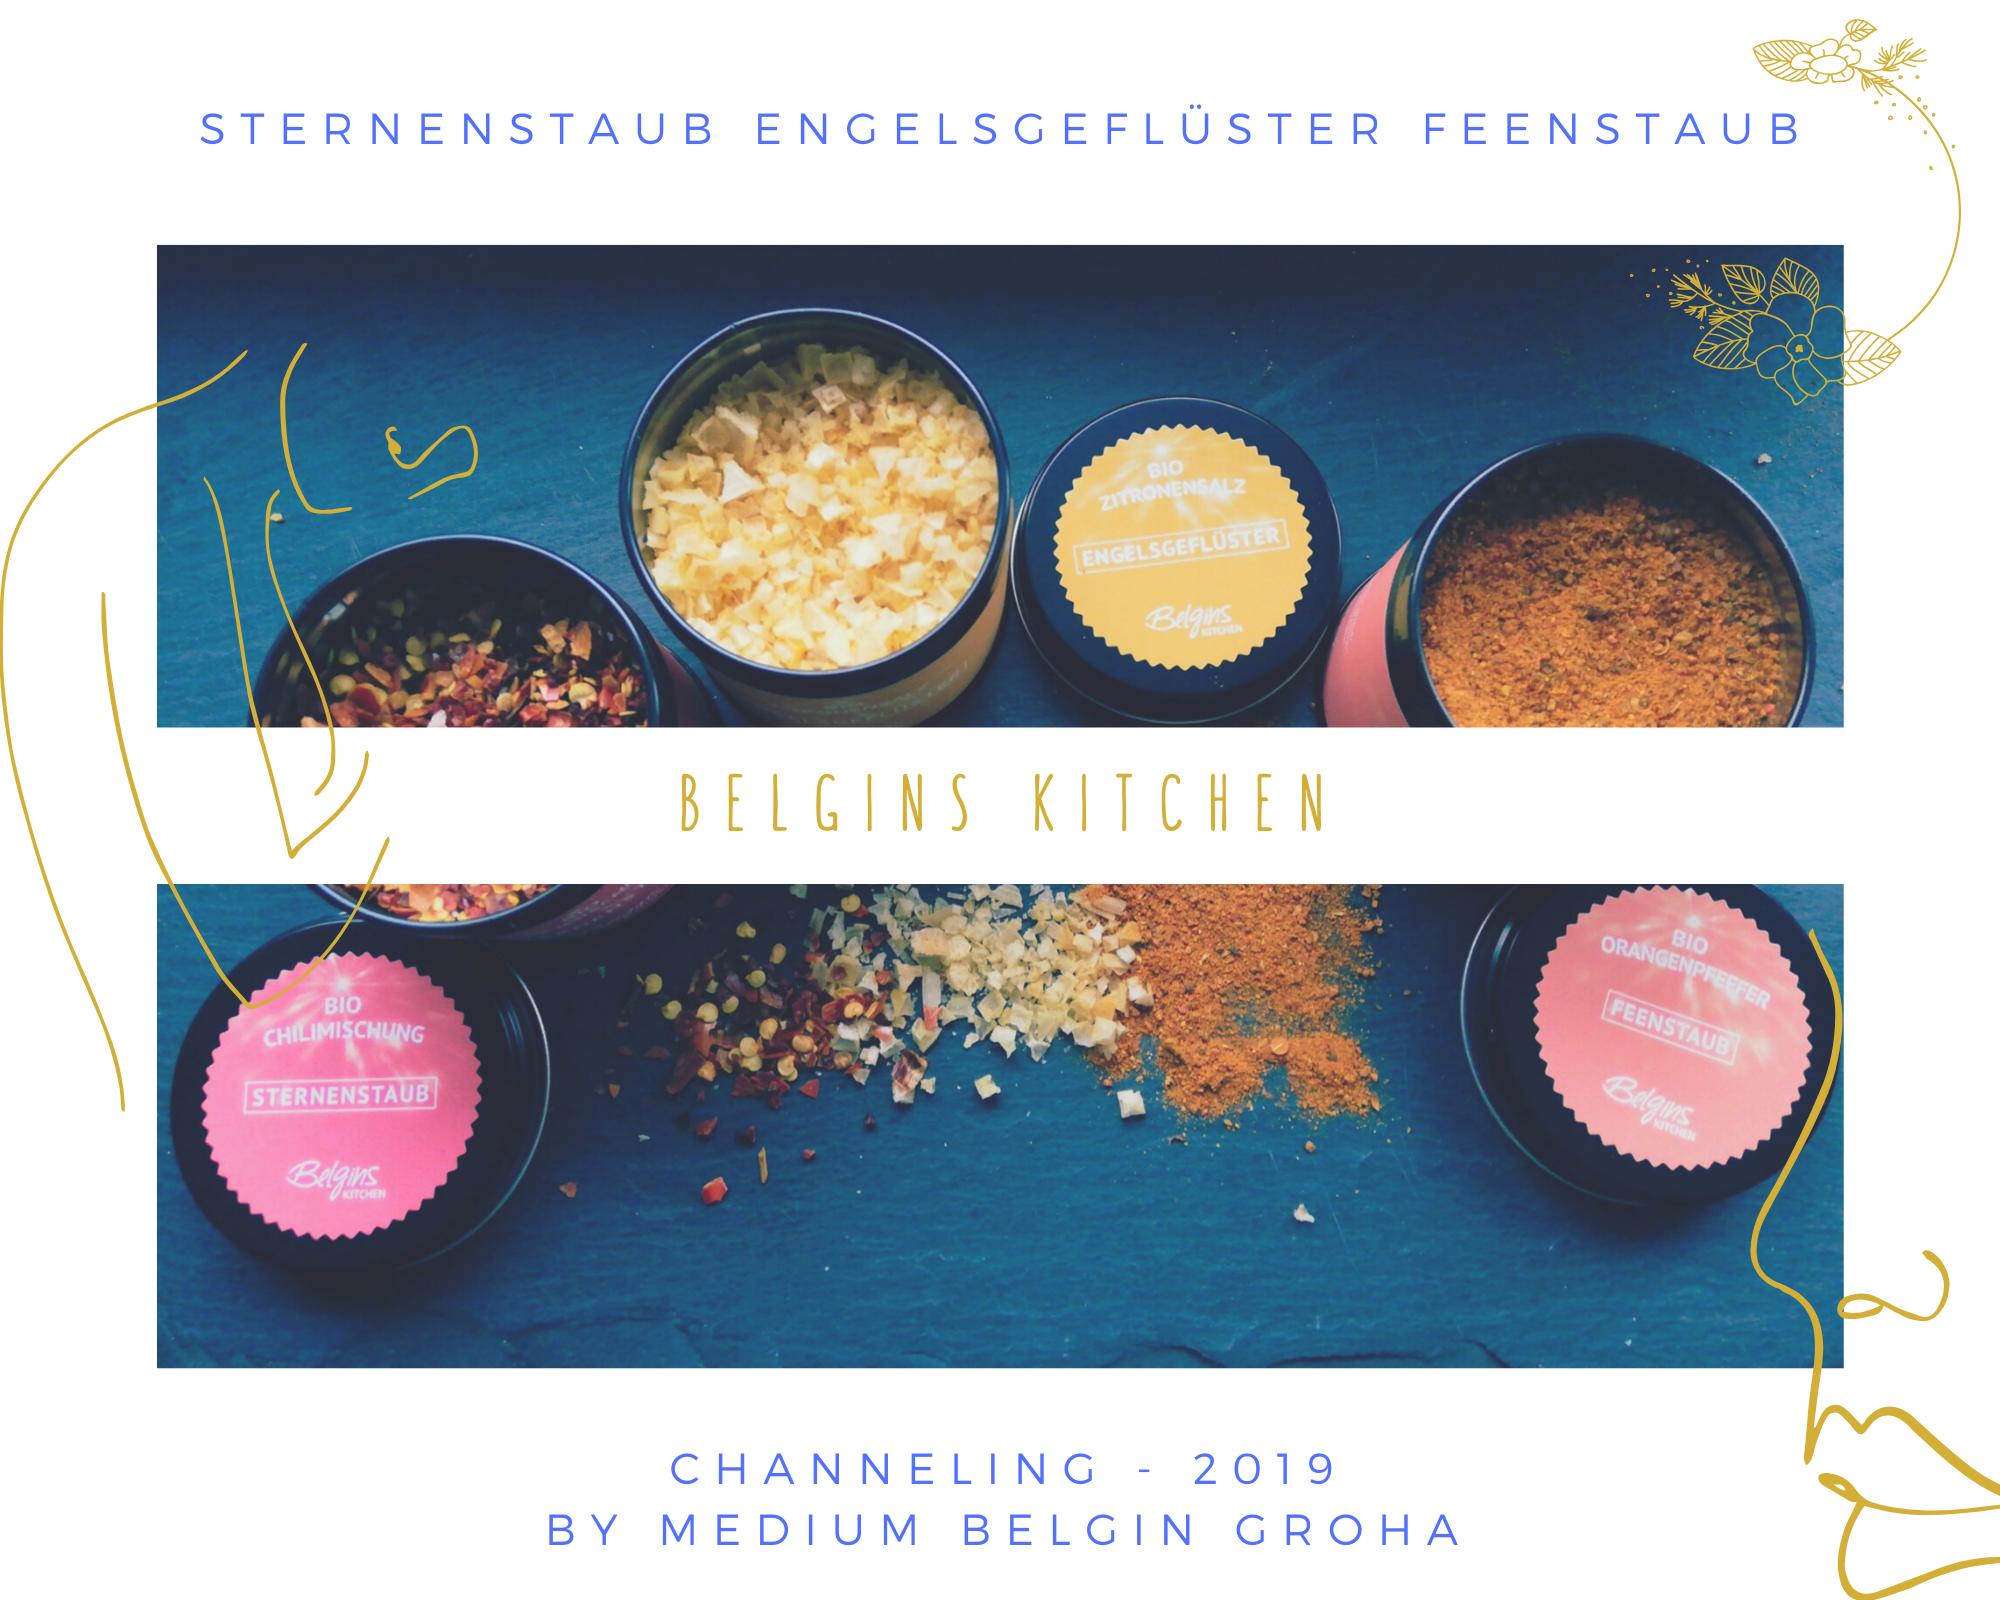 Channeling 2019 by Medium Belgin Groha